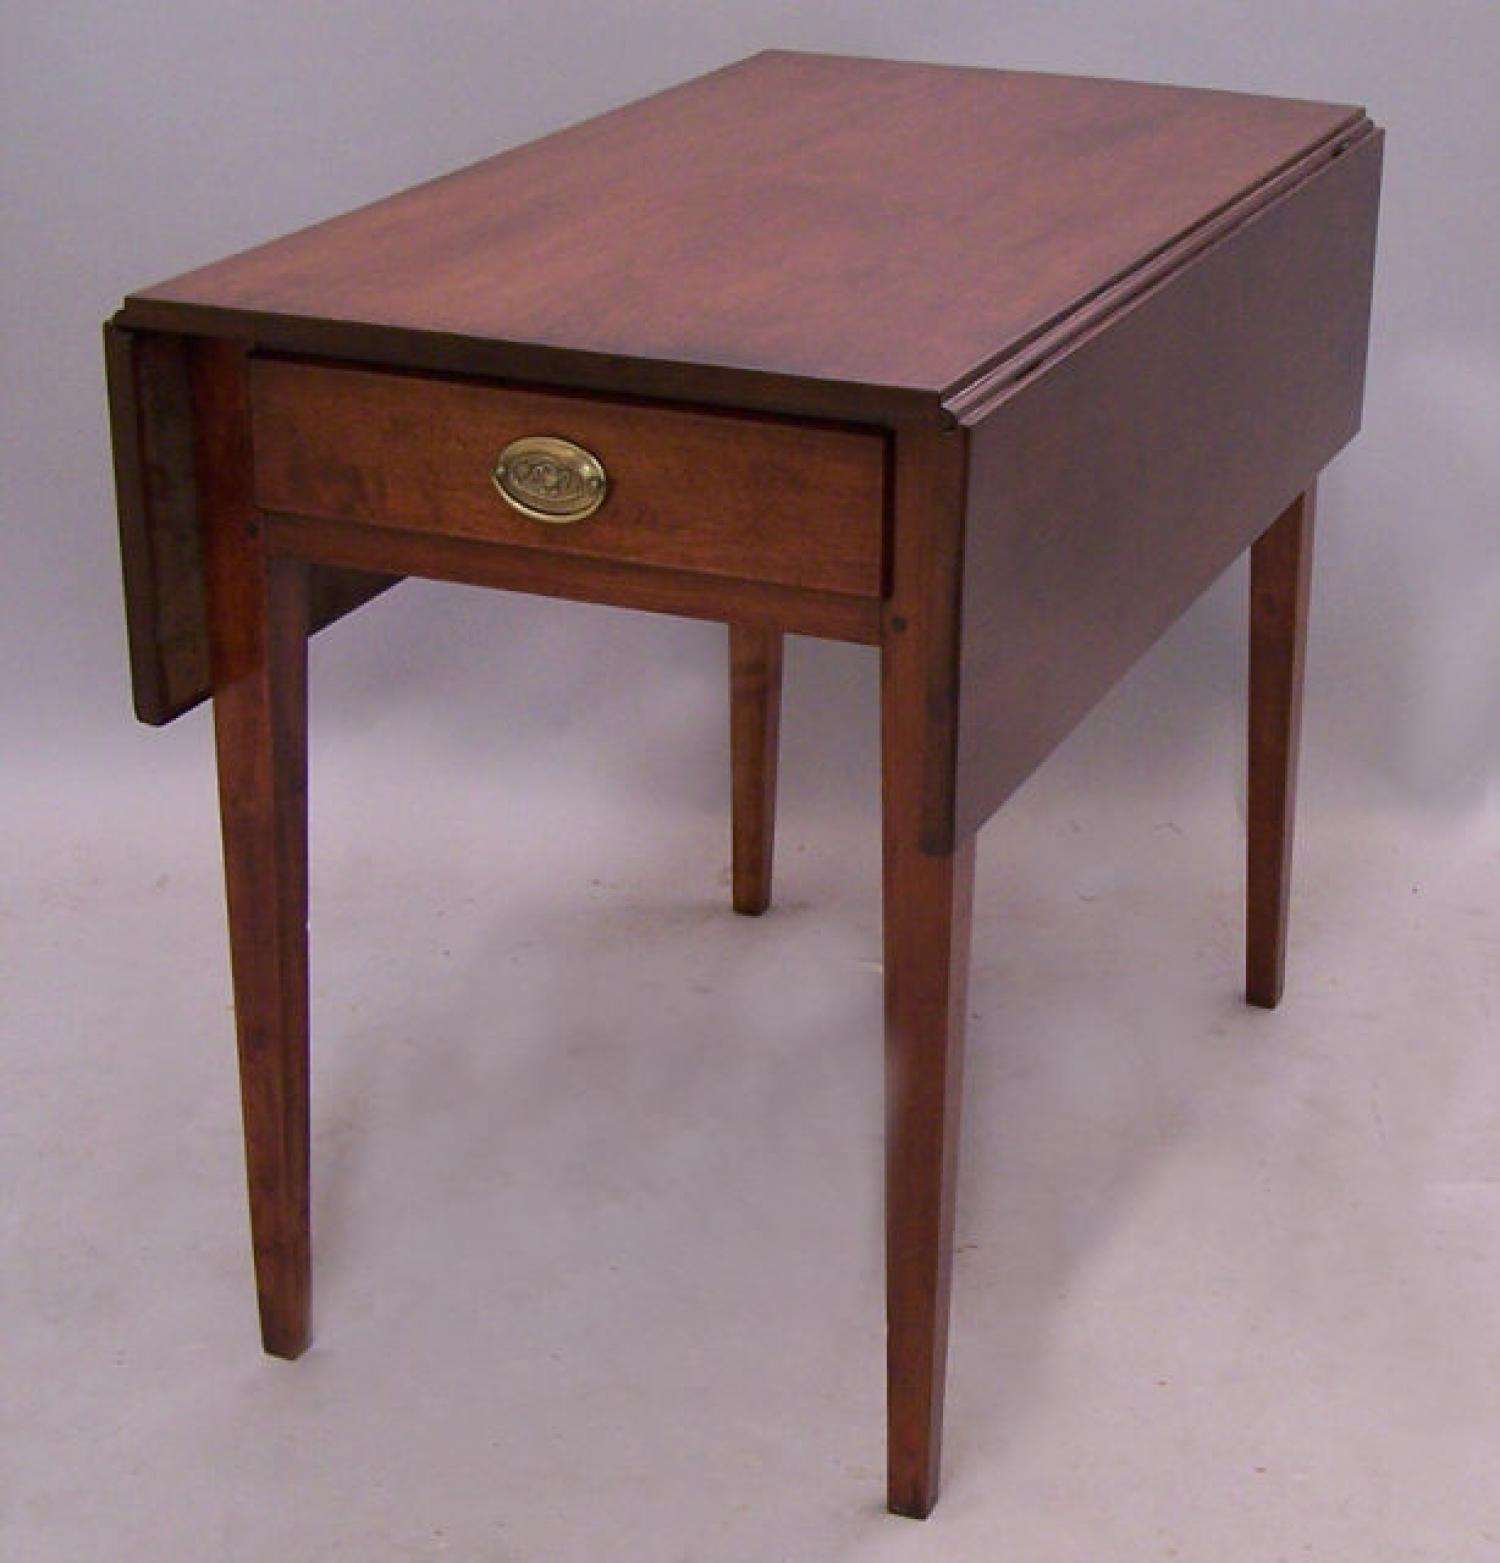 Period American Hepplewhite drop leaf cherry pembroke table c1790